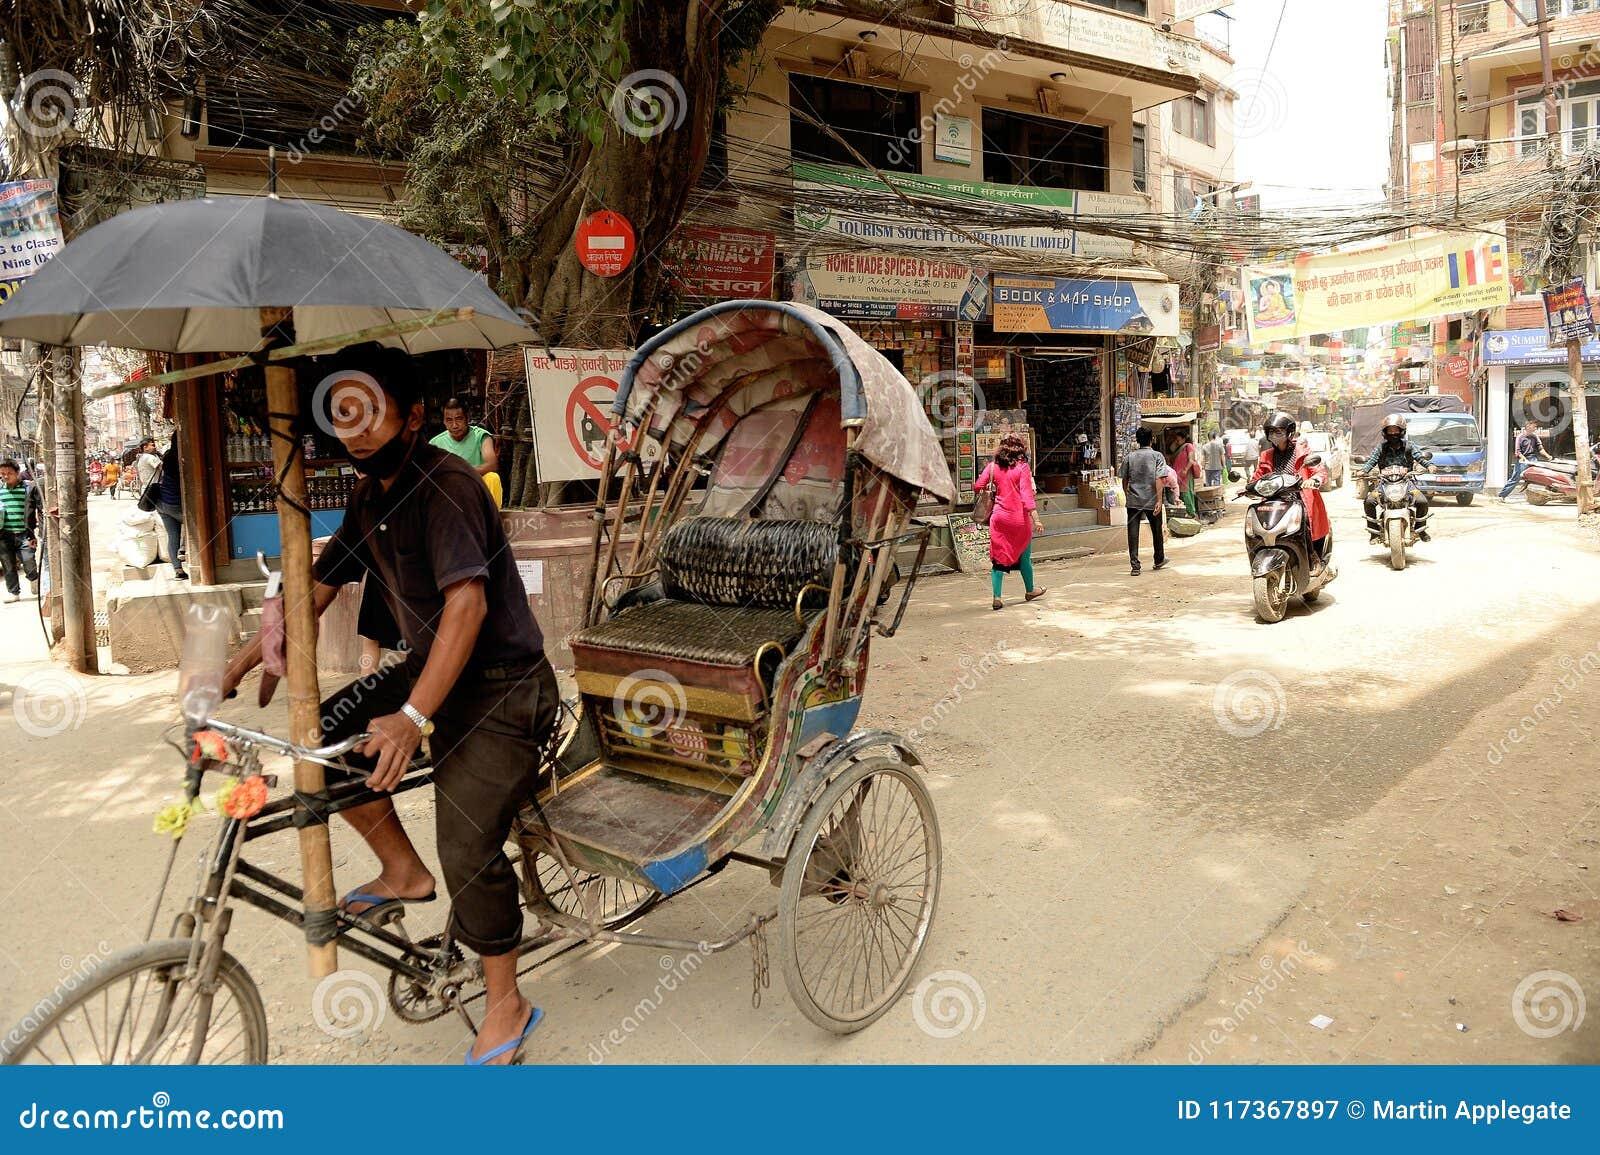 Kathmandu City Street Map on windhoek city street map, shanghai city street map, juba city street map, chicago city street map, munich city street map, jerusalem city street map, montevideo city street map, phoenix city street map, athens city street map, kowloon city street map, kigali city street map, hobart city street map,